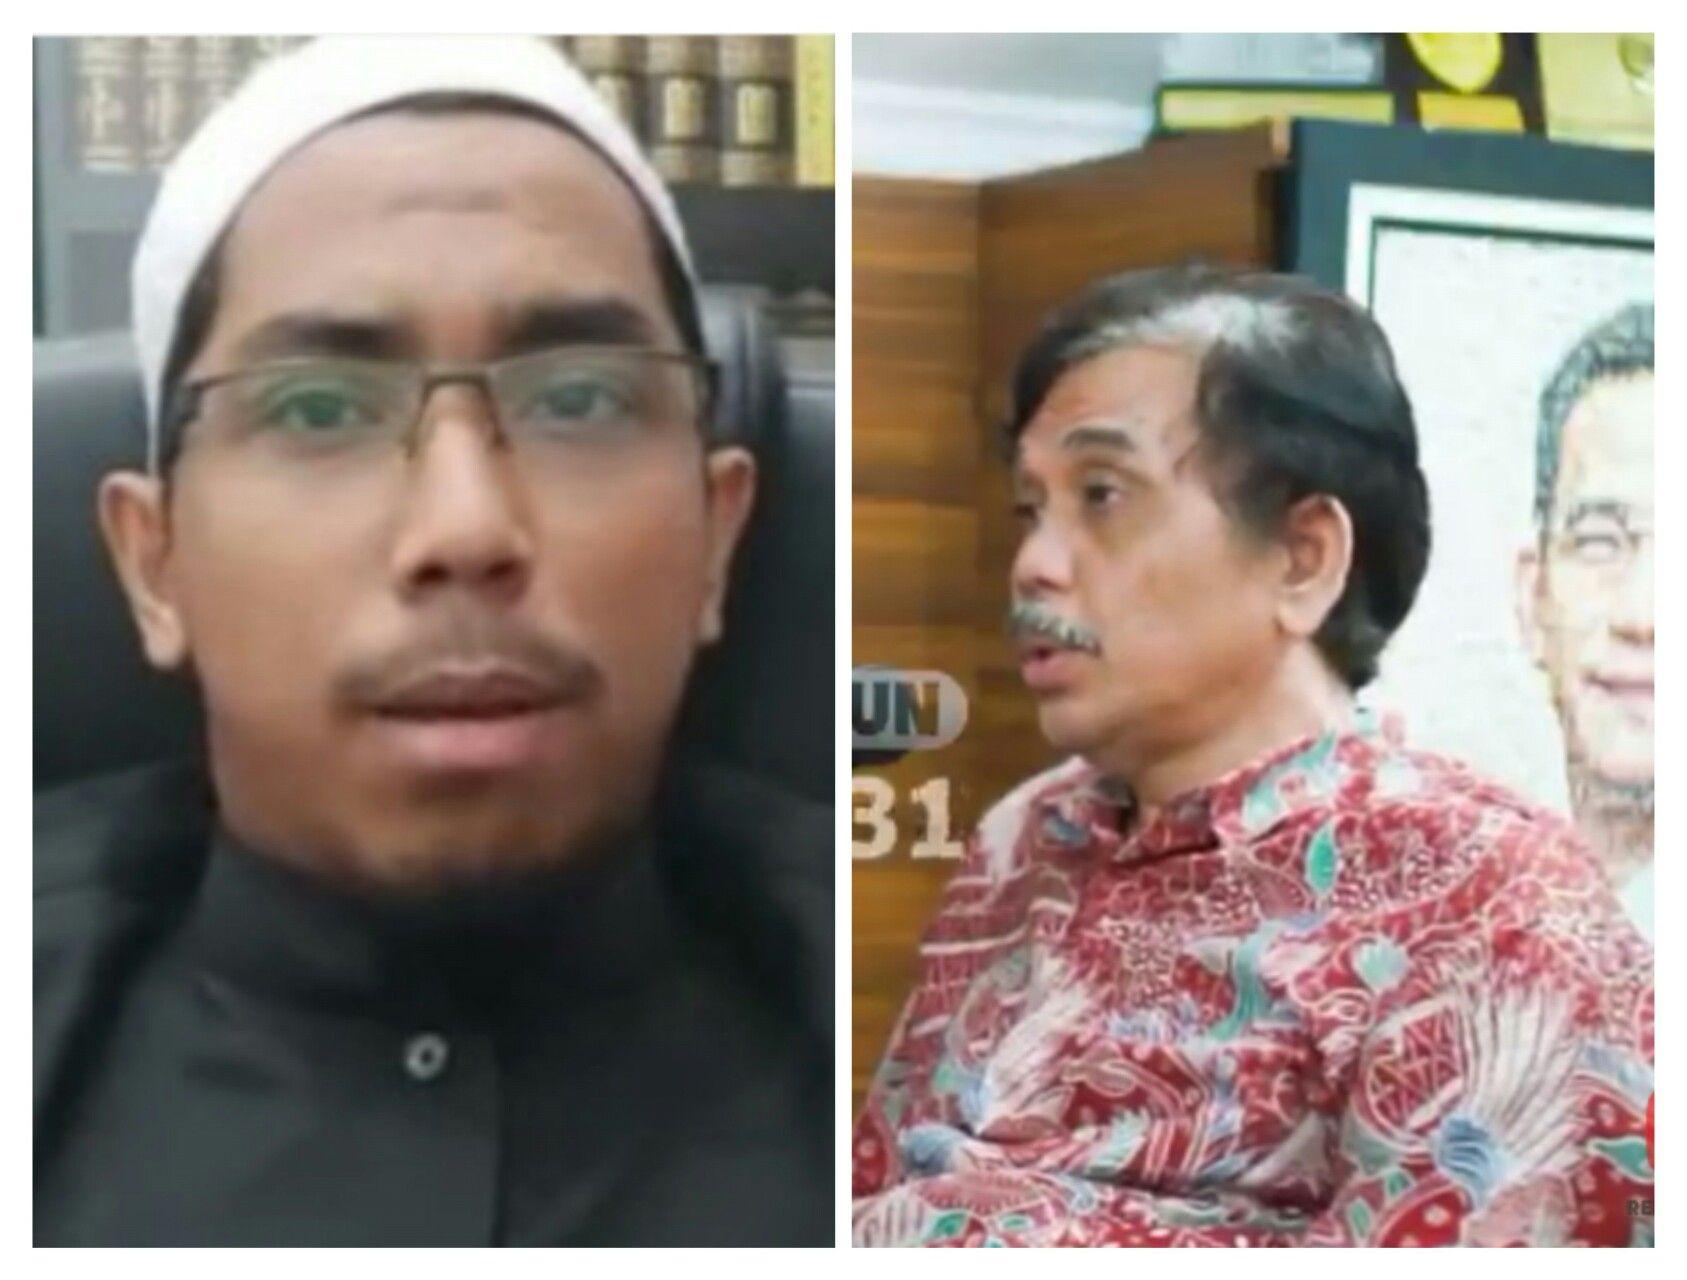 Aktivis KAMI Cerita Diminta HRS Jaga Almarhum Ustadz Maheer Saat di Rutan: Saya Sangat Sedih...